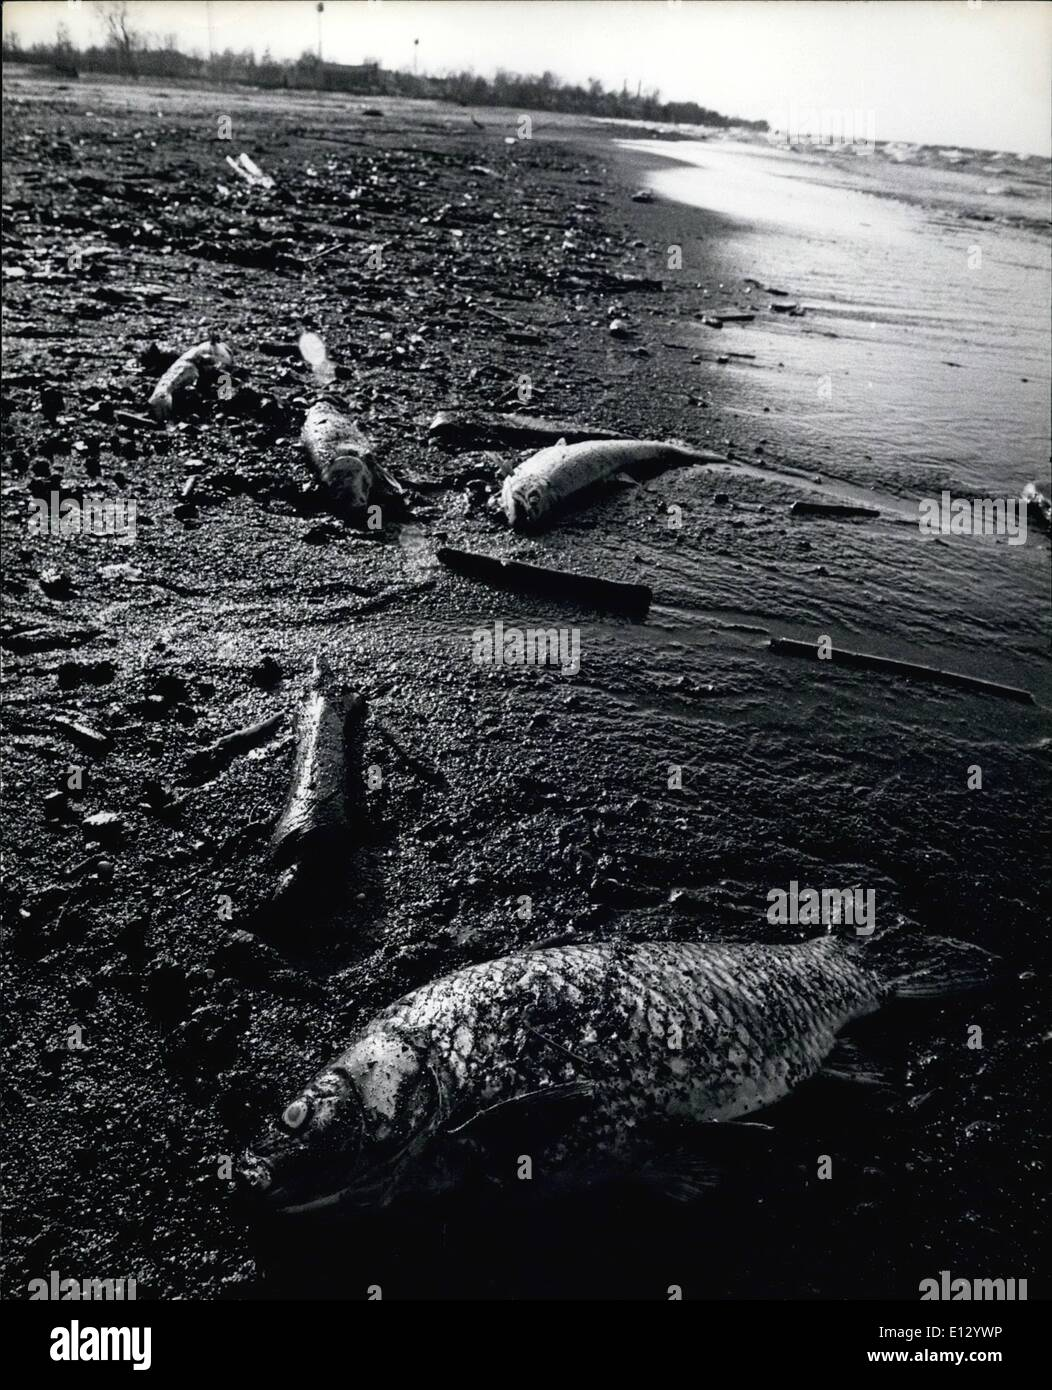 Feb. 26, 2012 - Lake Ontario, N.Y. Dead fish on beach. - Stock Image